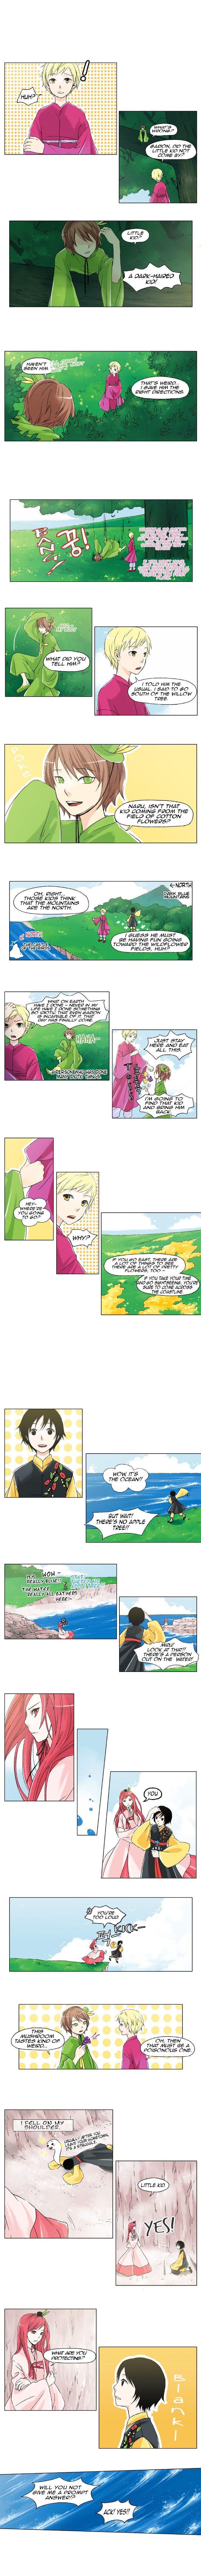 Star's Last Wish 3 Page 3